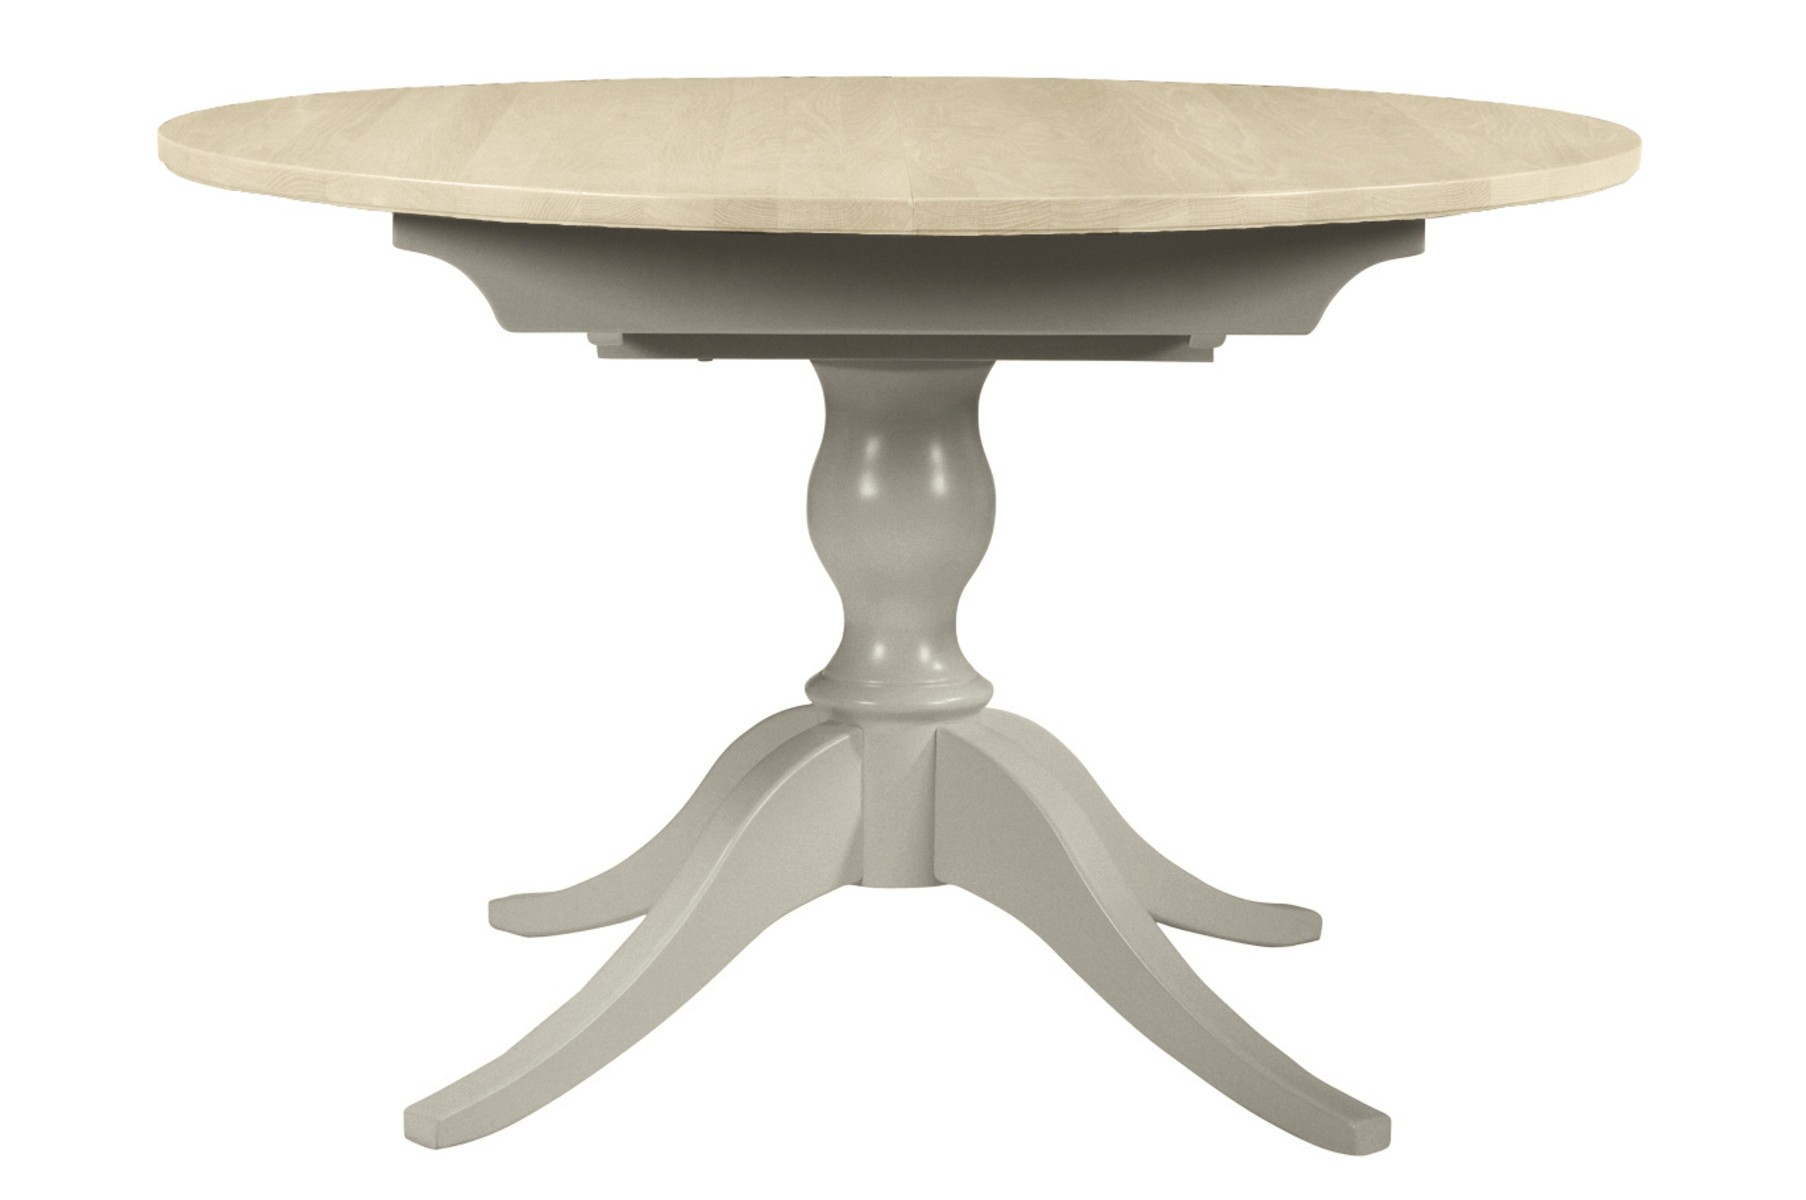 Genial mesa comedor redonda extensible fotos mesas de - Mesas de madera redondas extensibles ...